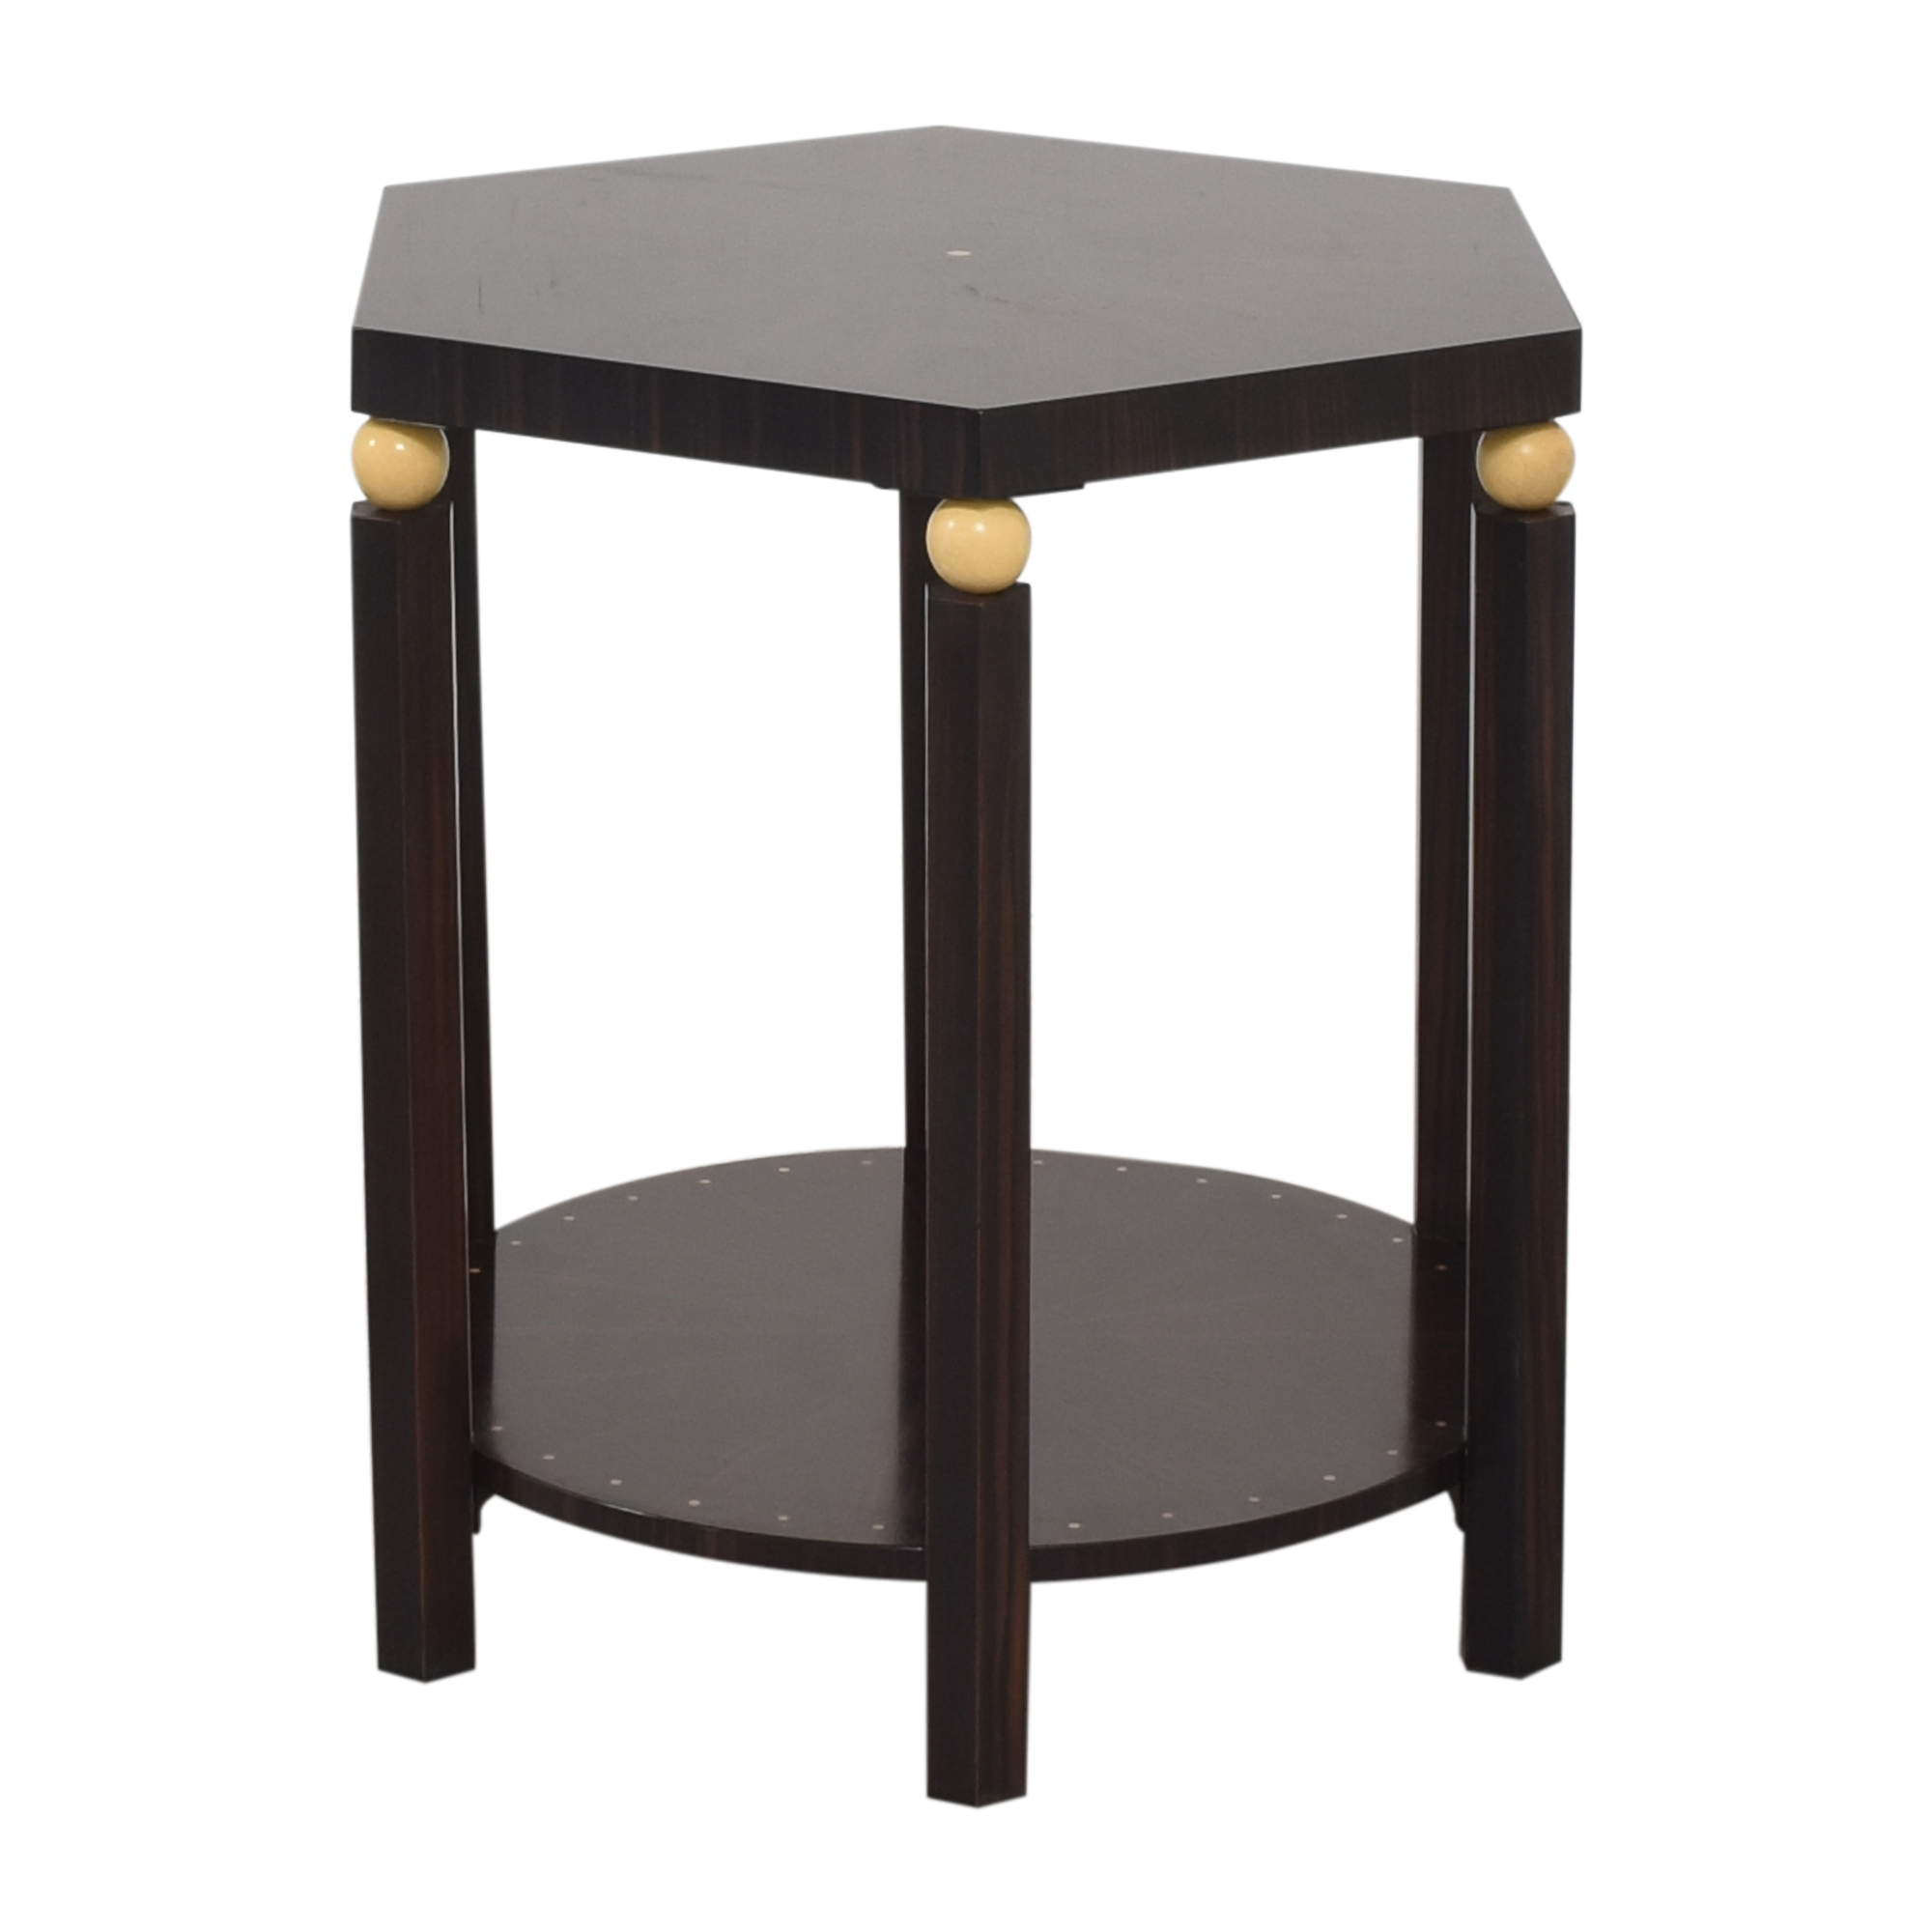 EJ Victor EJ Victor Hexagonal Side Table price